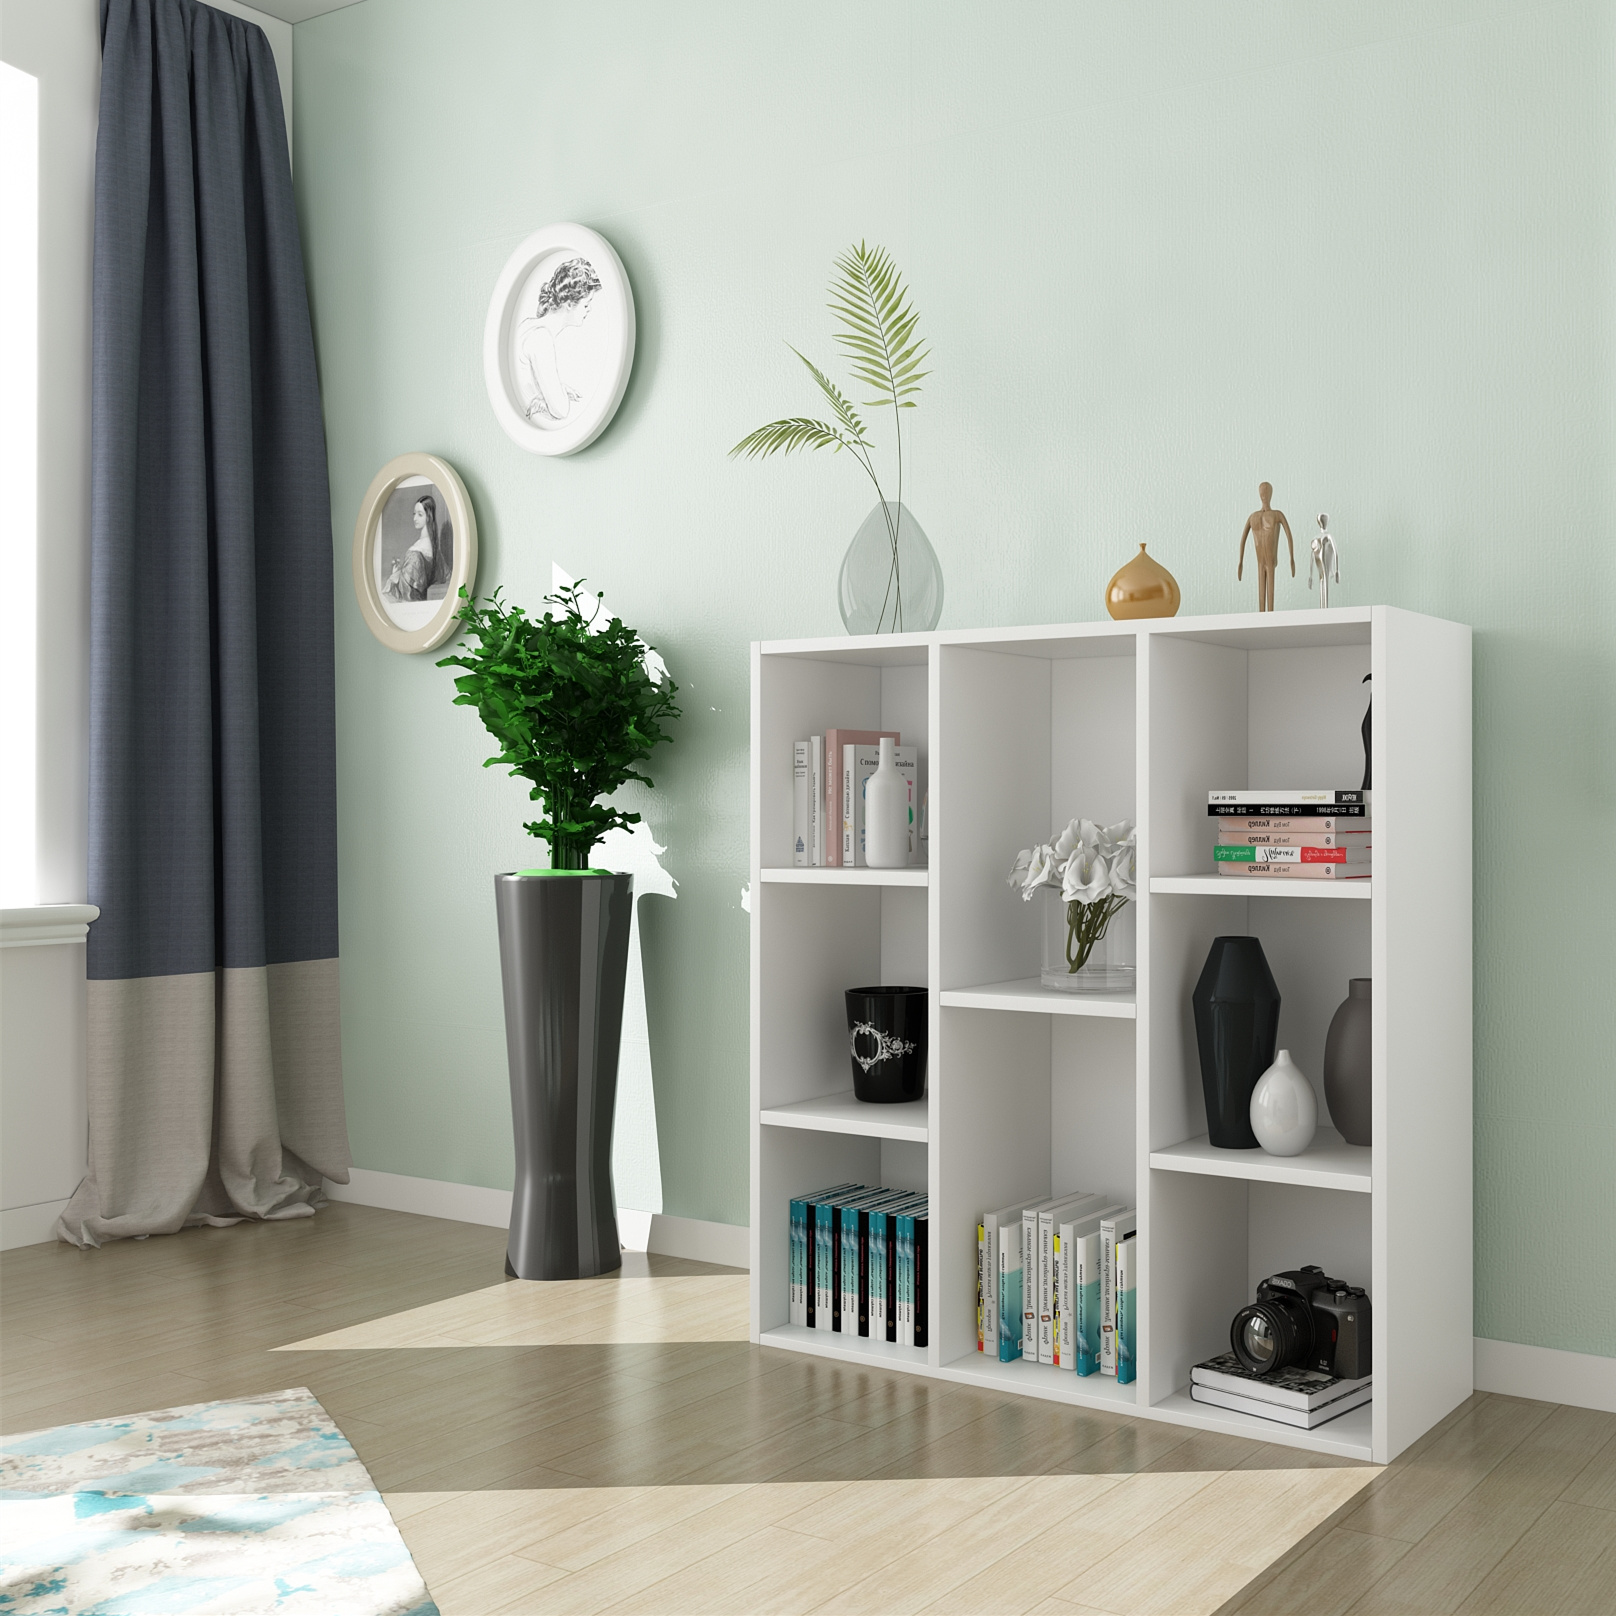 Five simple locker room Shelf Bookcase simple shelf storage cabinet cabinet cabinet lattice free combination